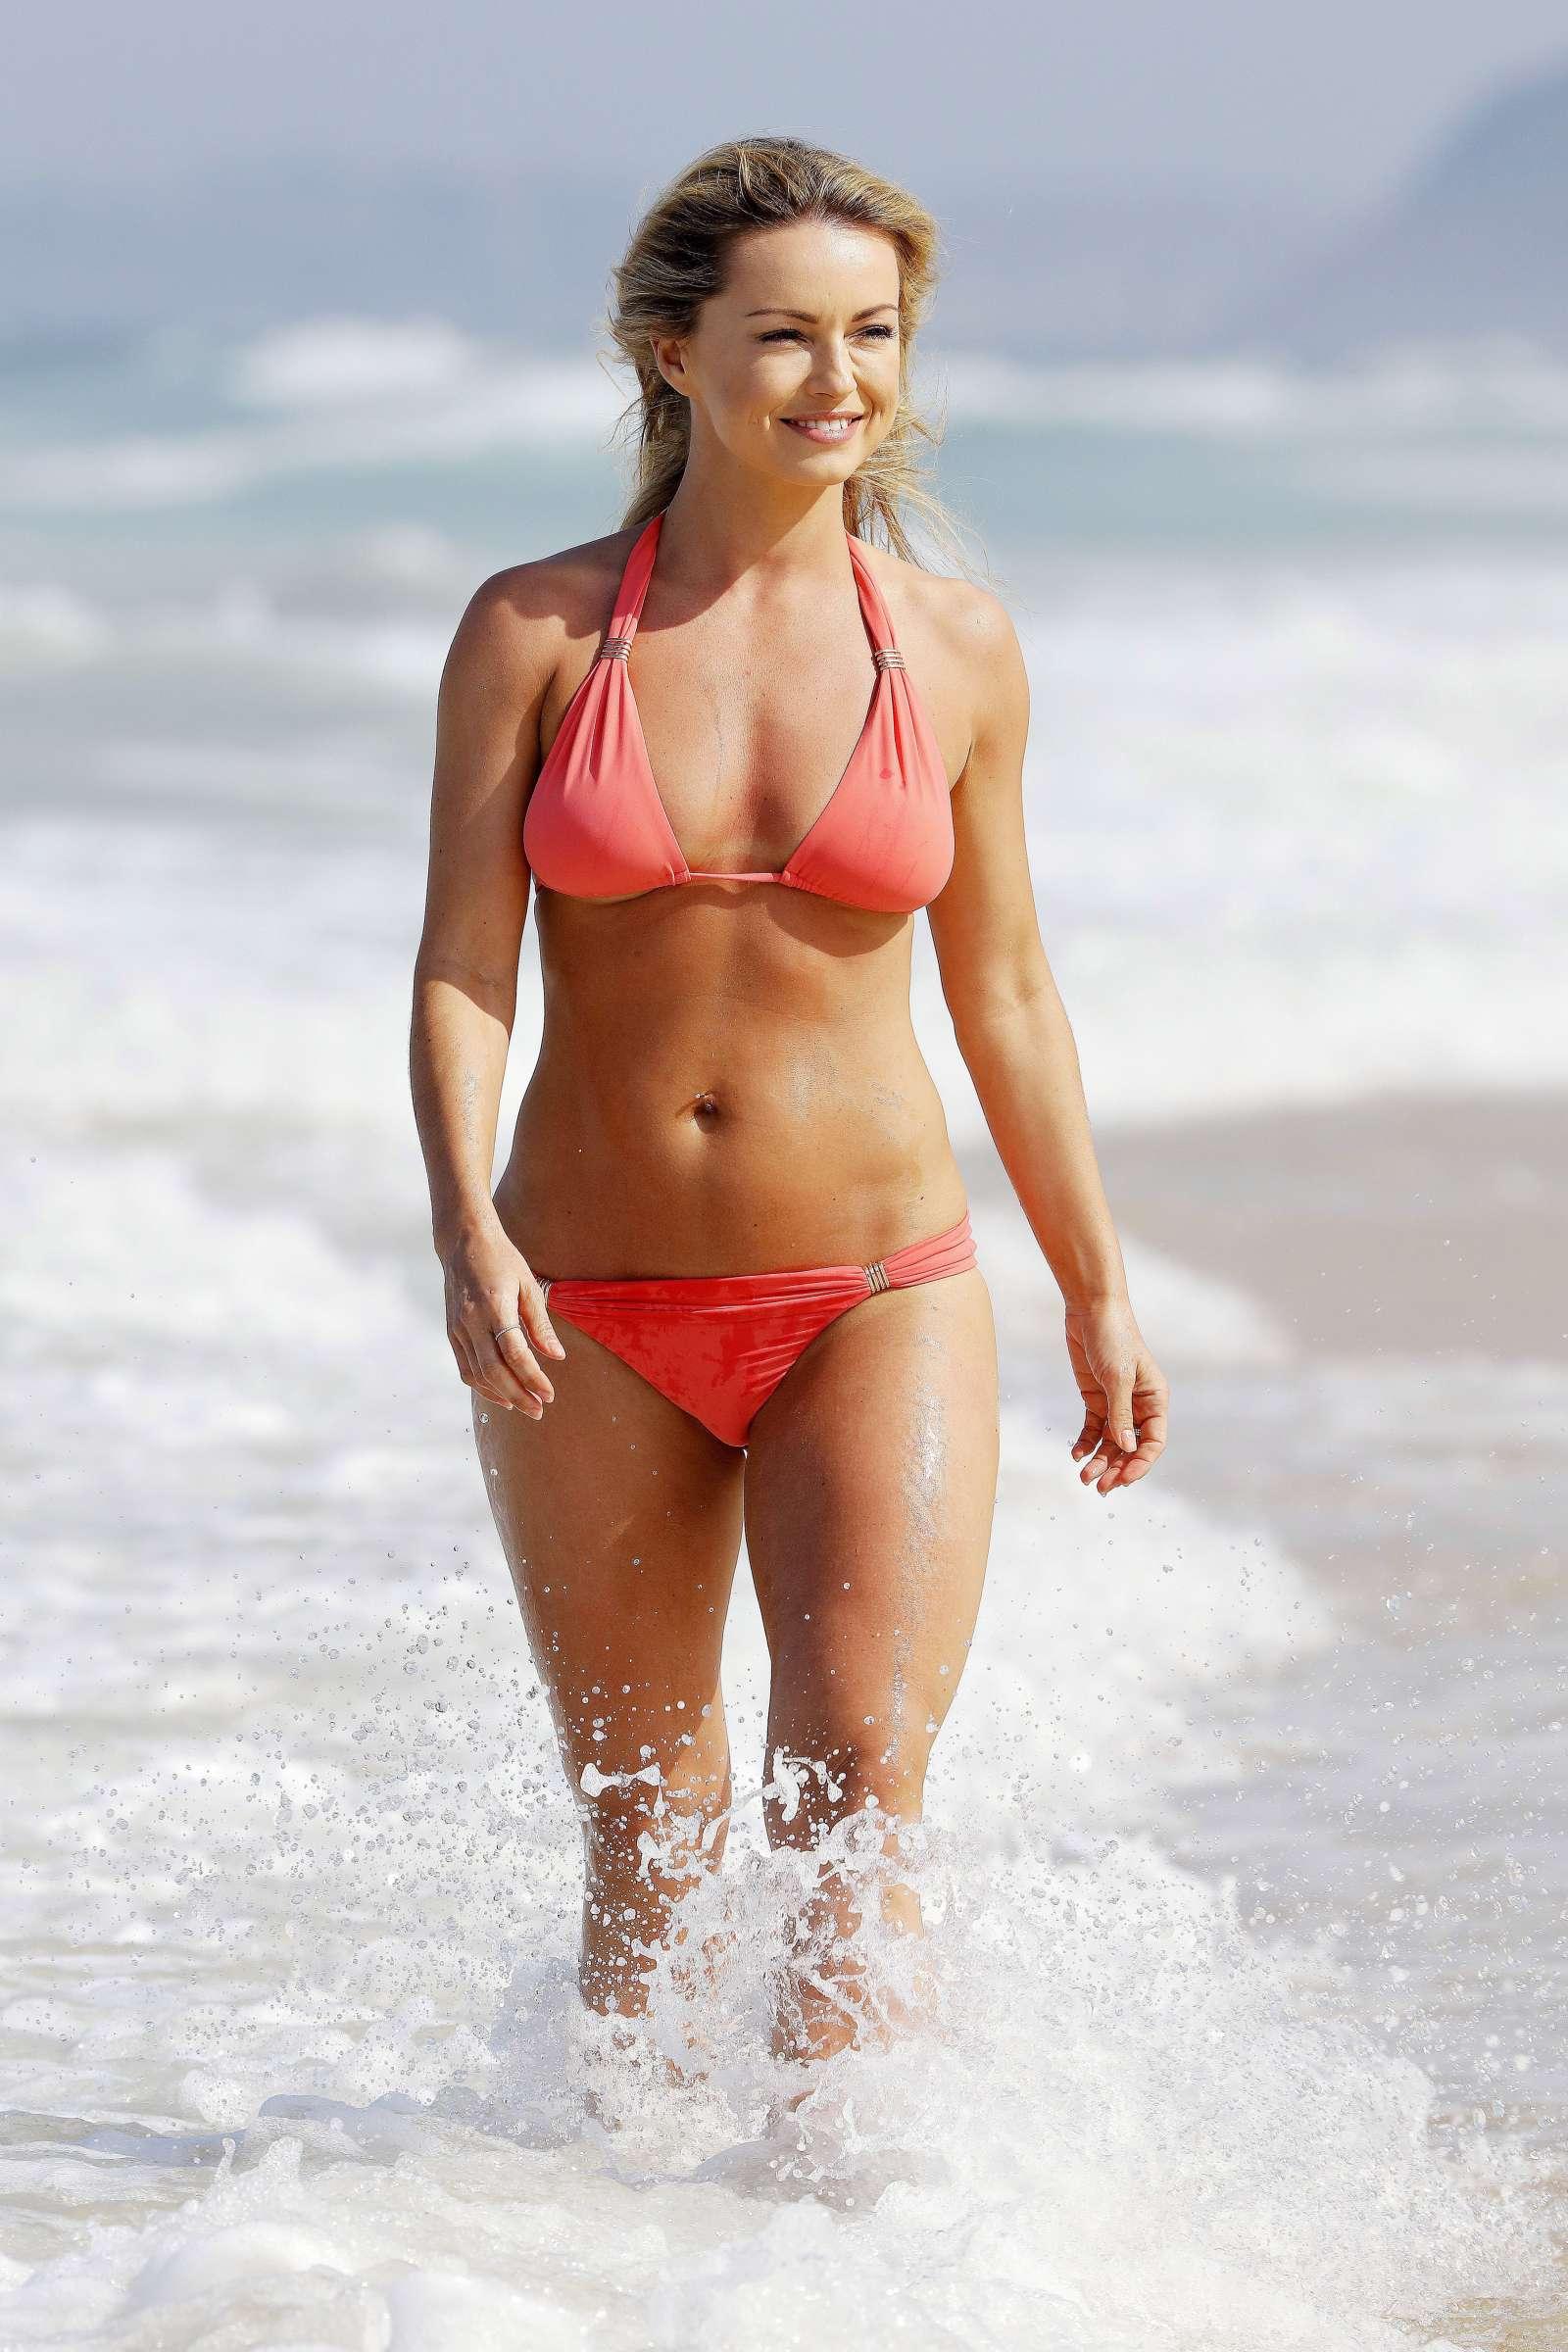 Bikini Ola Jordan nudes (98 foto and video), Sexy, Hot, Boobs, butt 2006